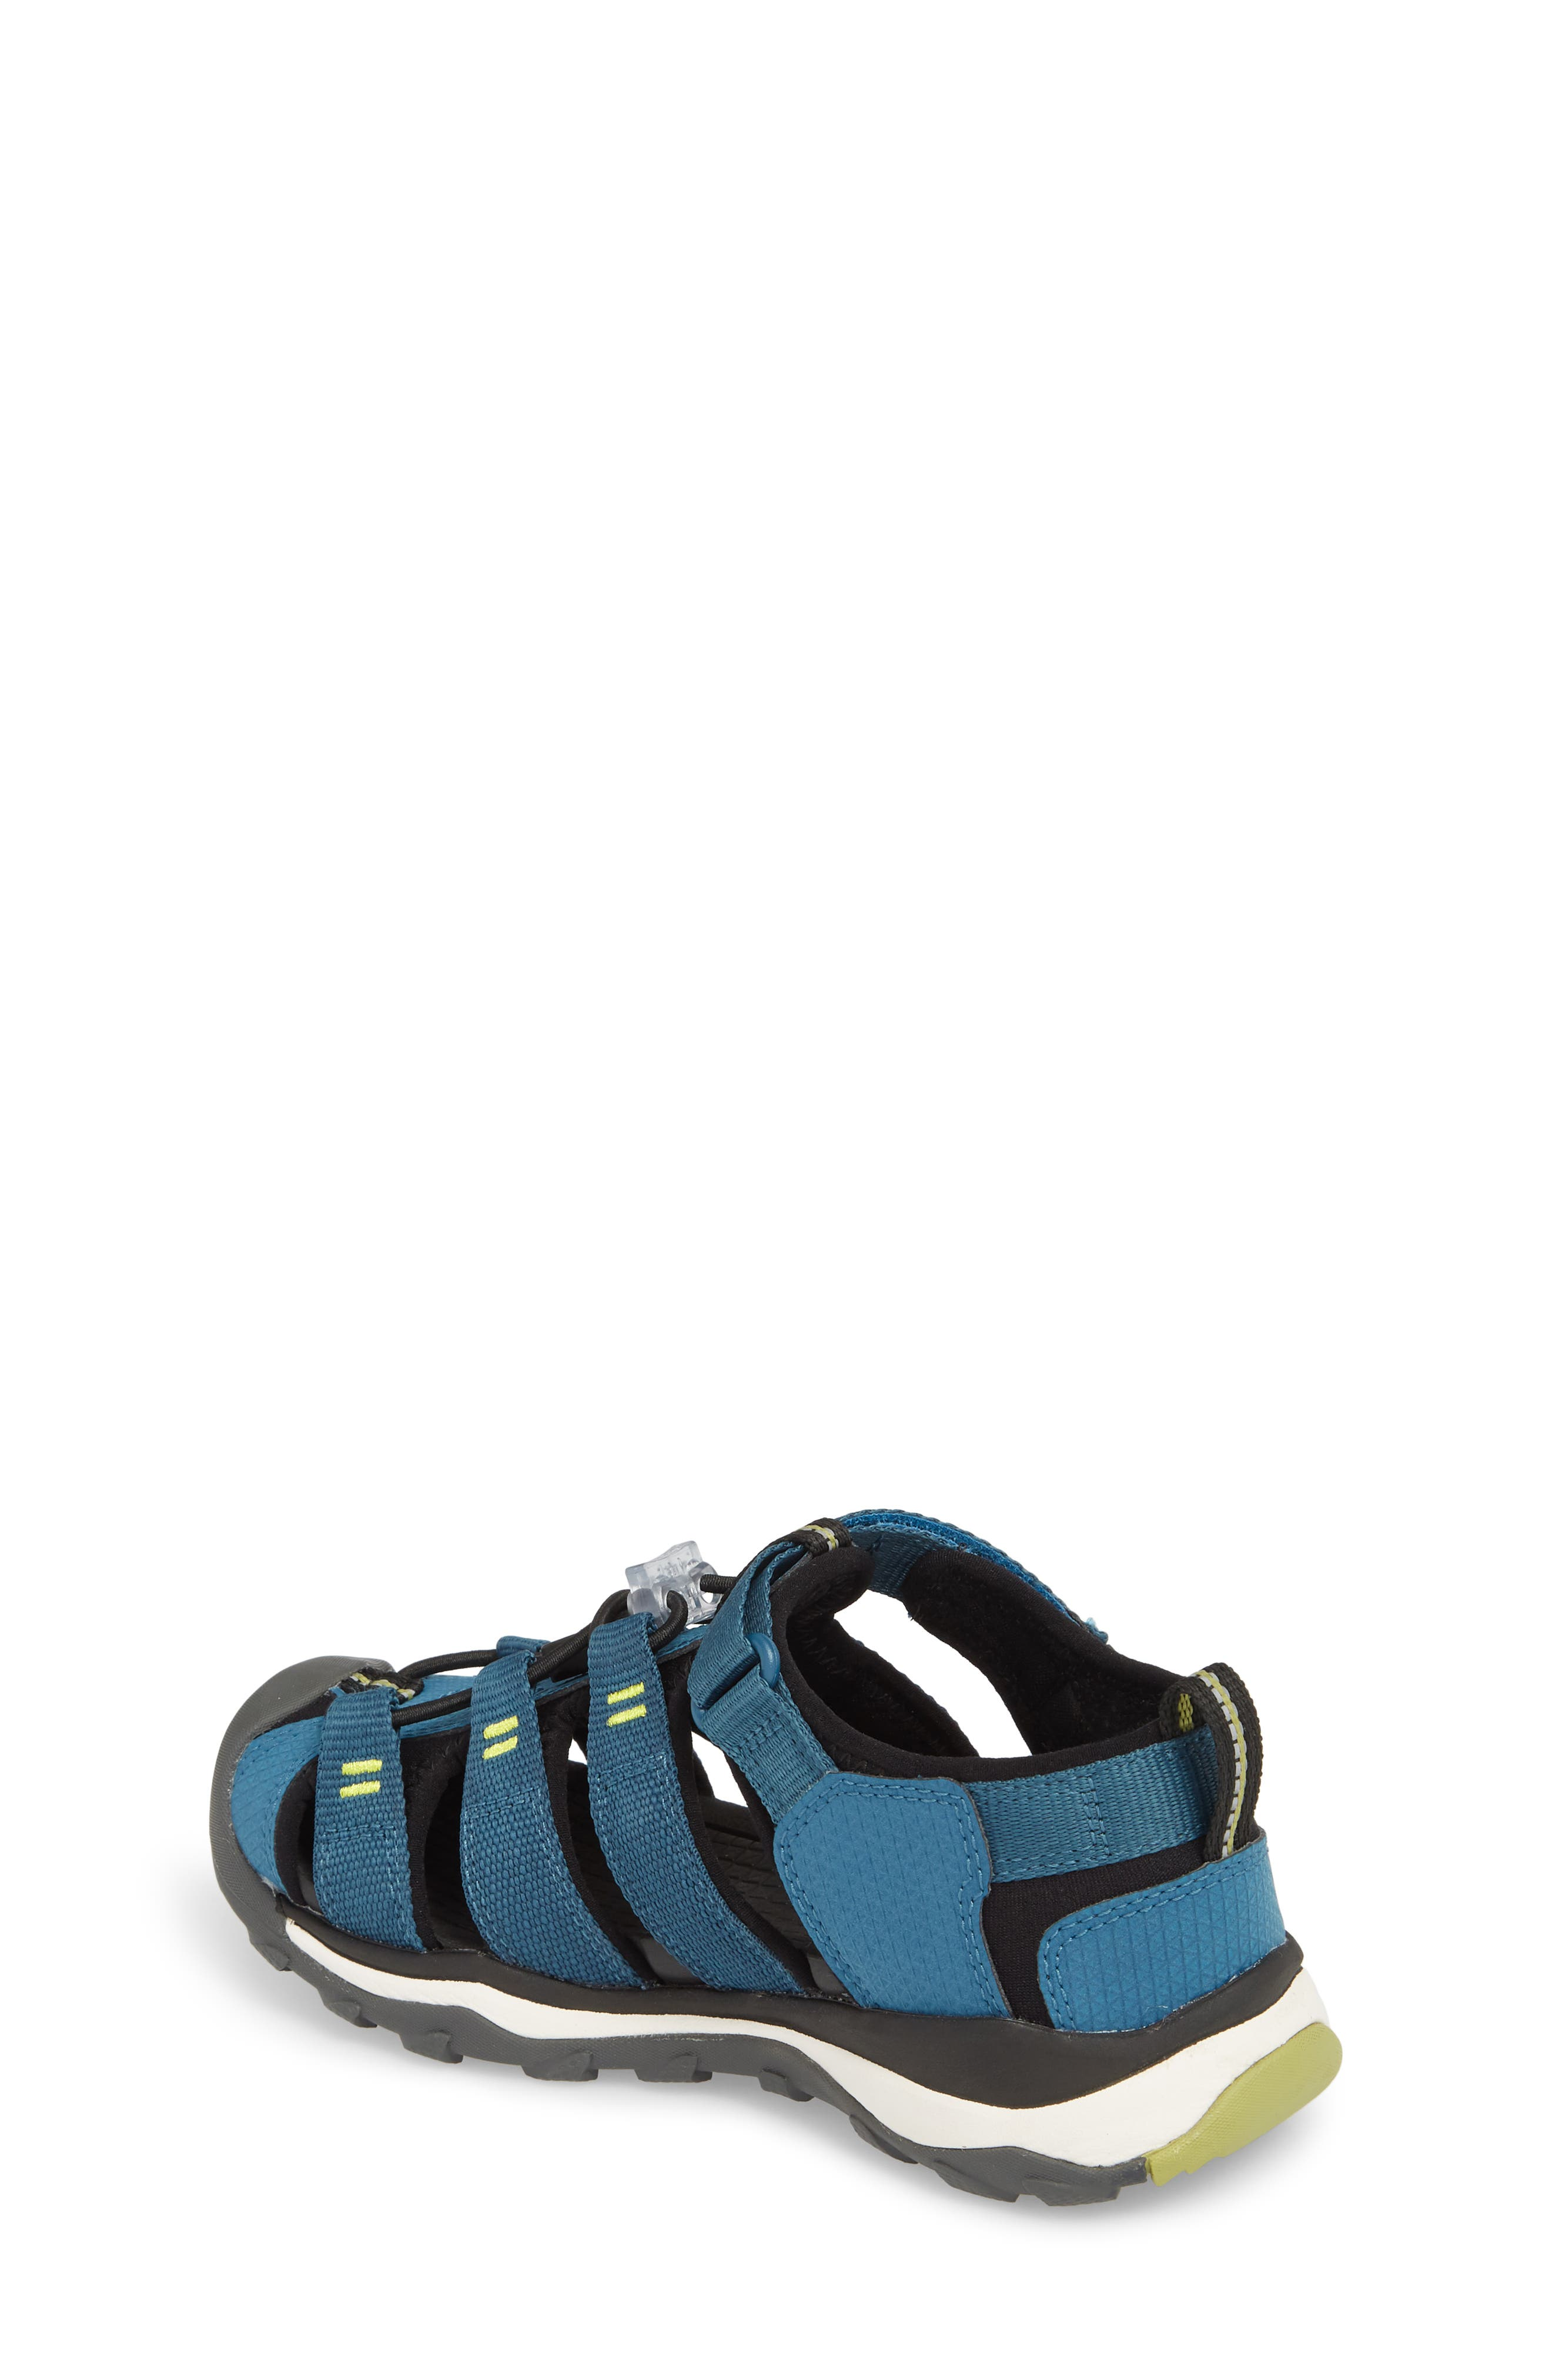 Newport Neo H2 Water Friendly Sandal,                             Alternate thumbnail 2, color,                             LEGION BLUE/ MOSS